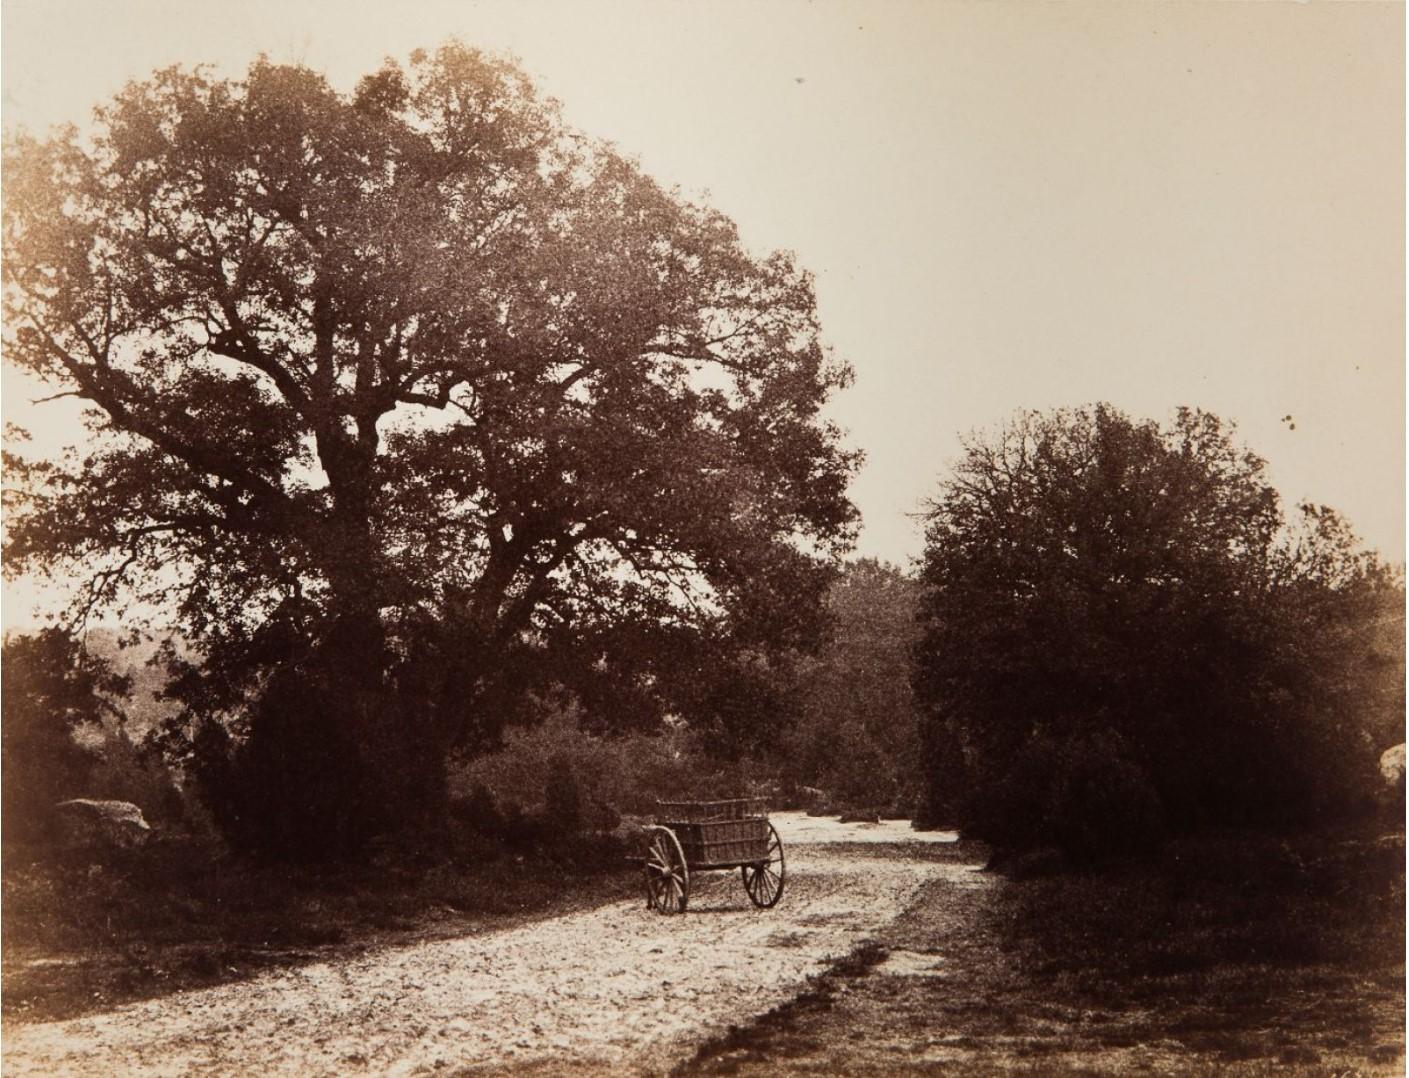 1862. Тележка на улице, октябрь